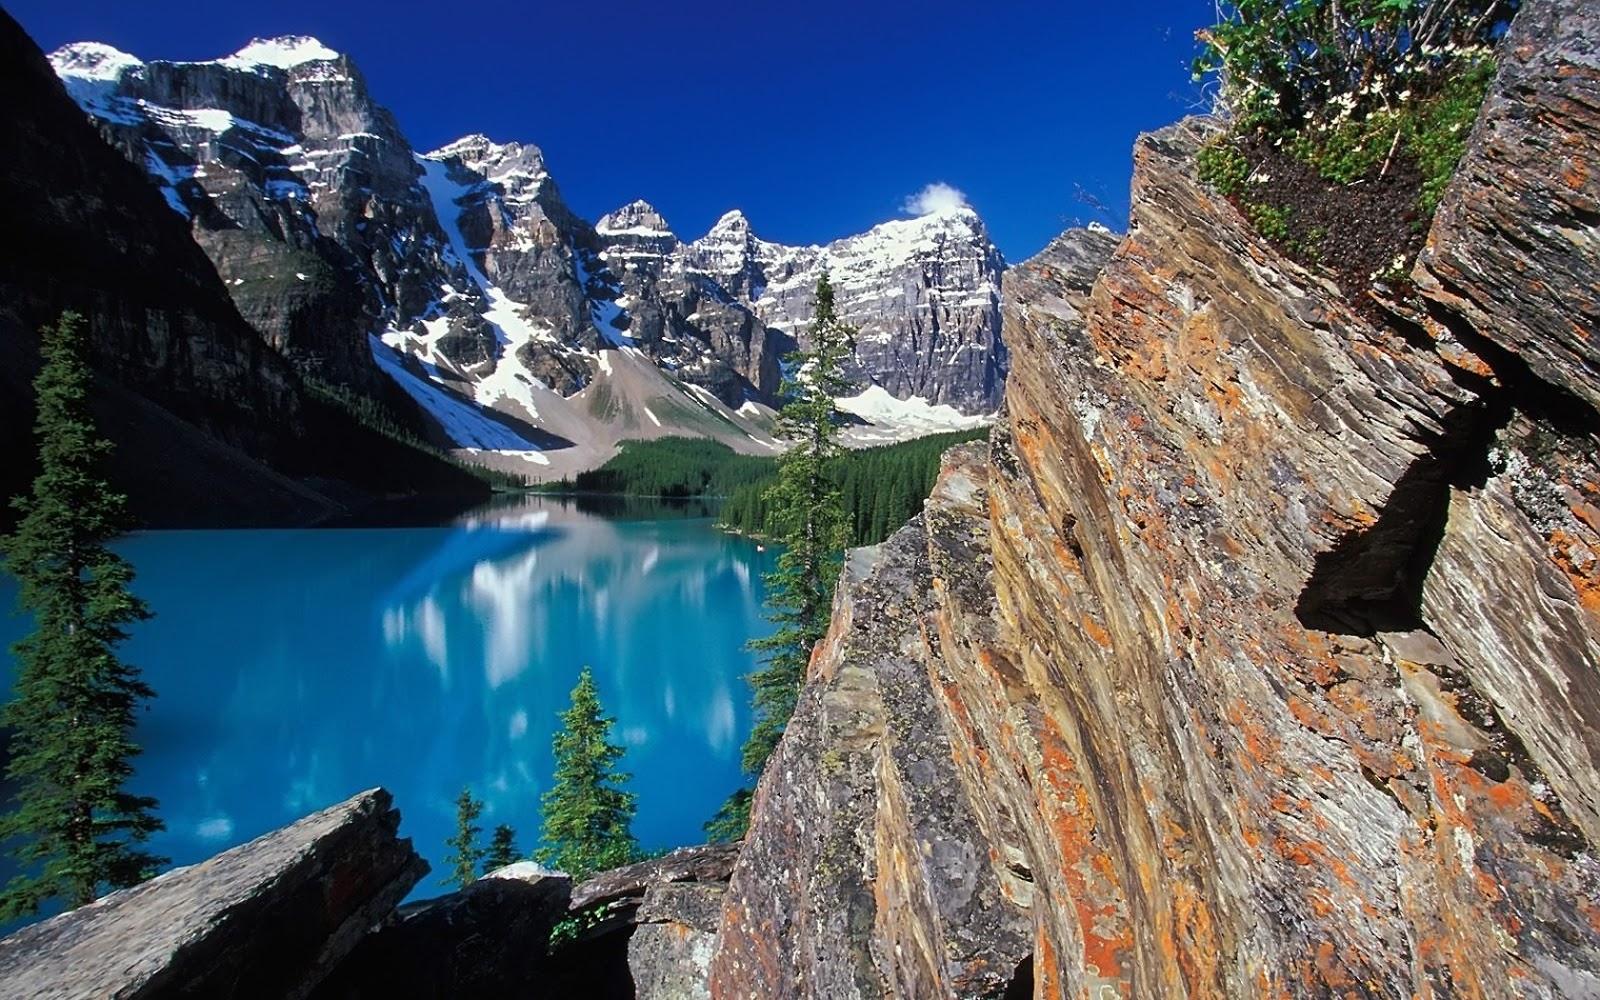 nationalpark alberta kanada - photo #7